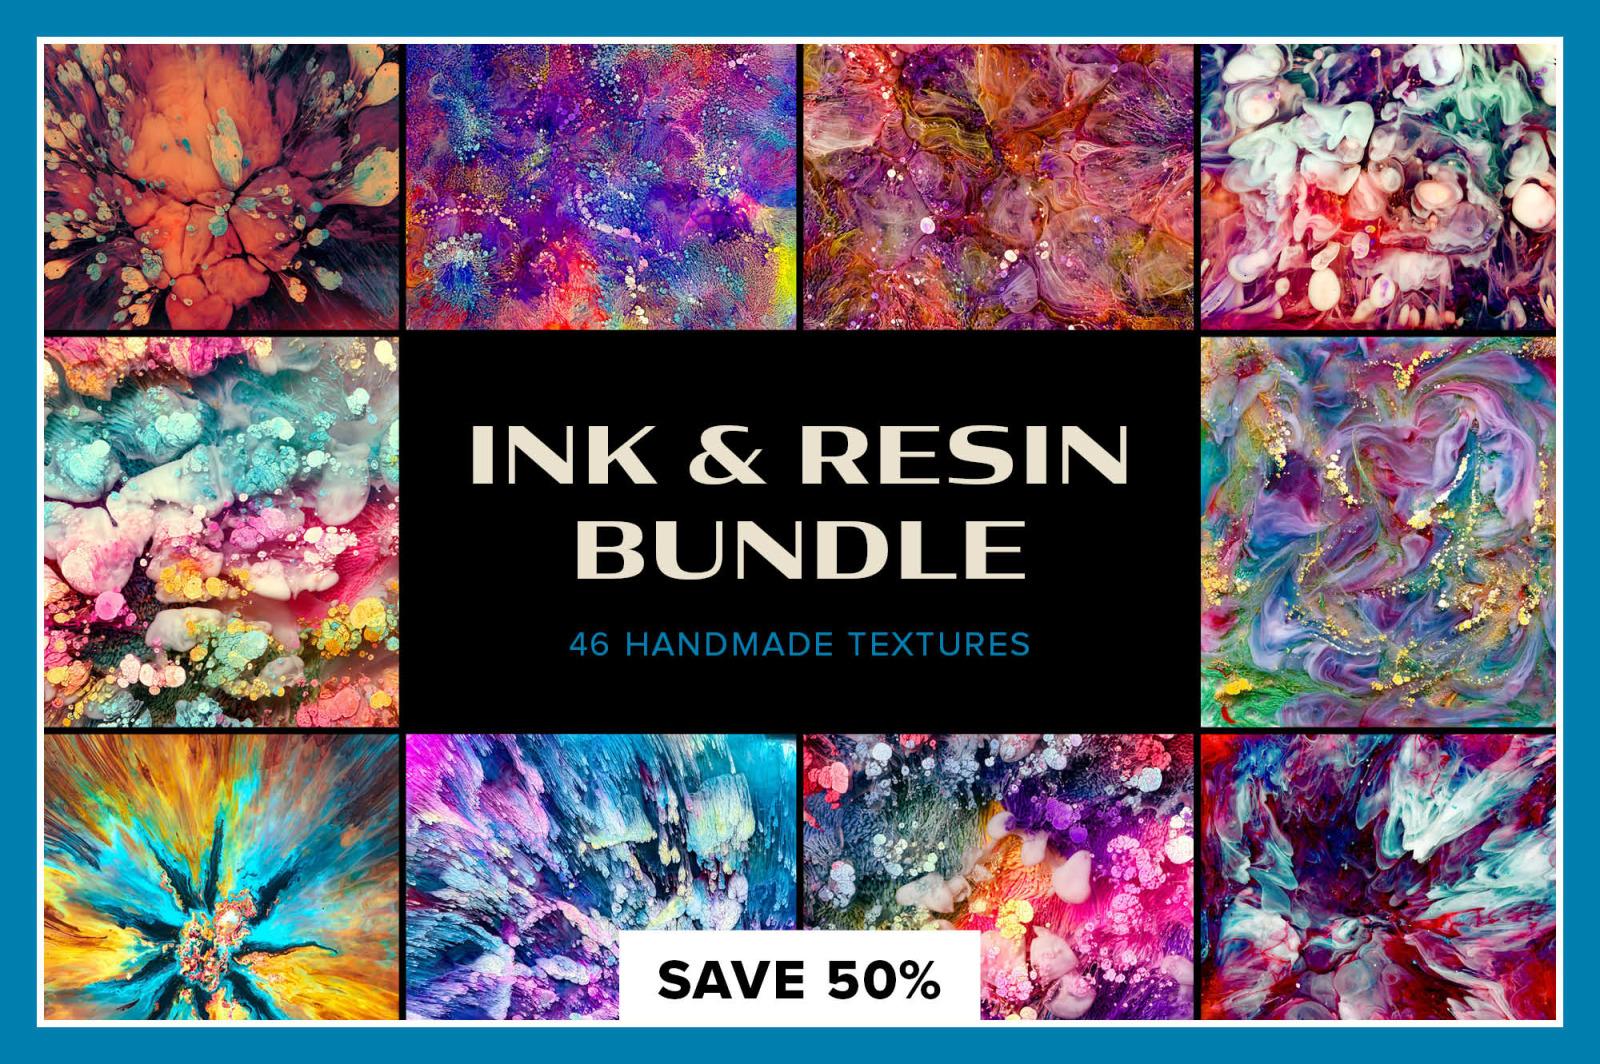 Ink & Resin Bundle